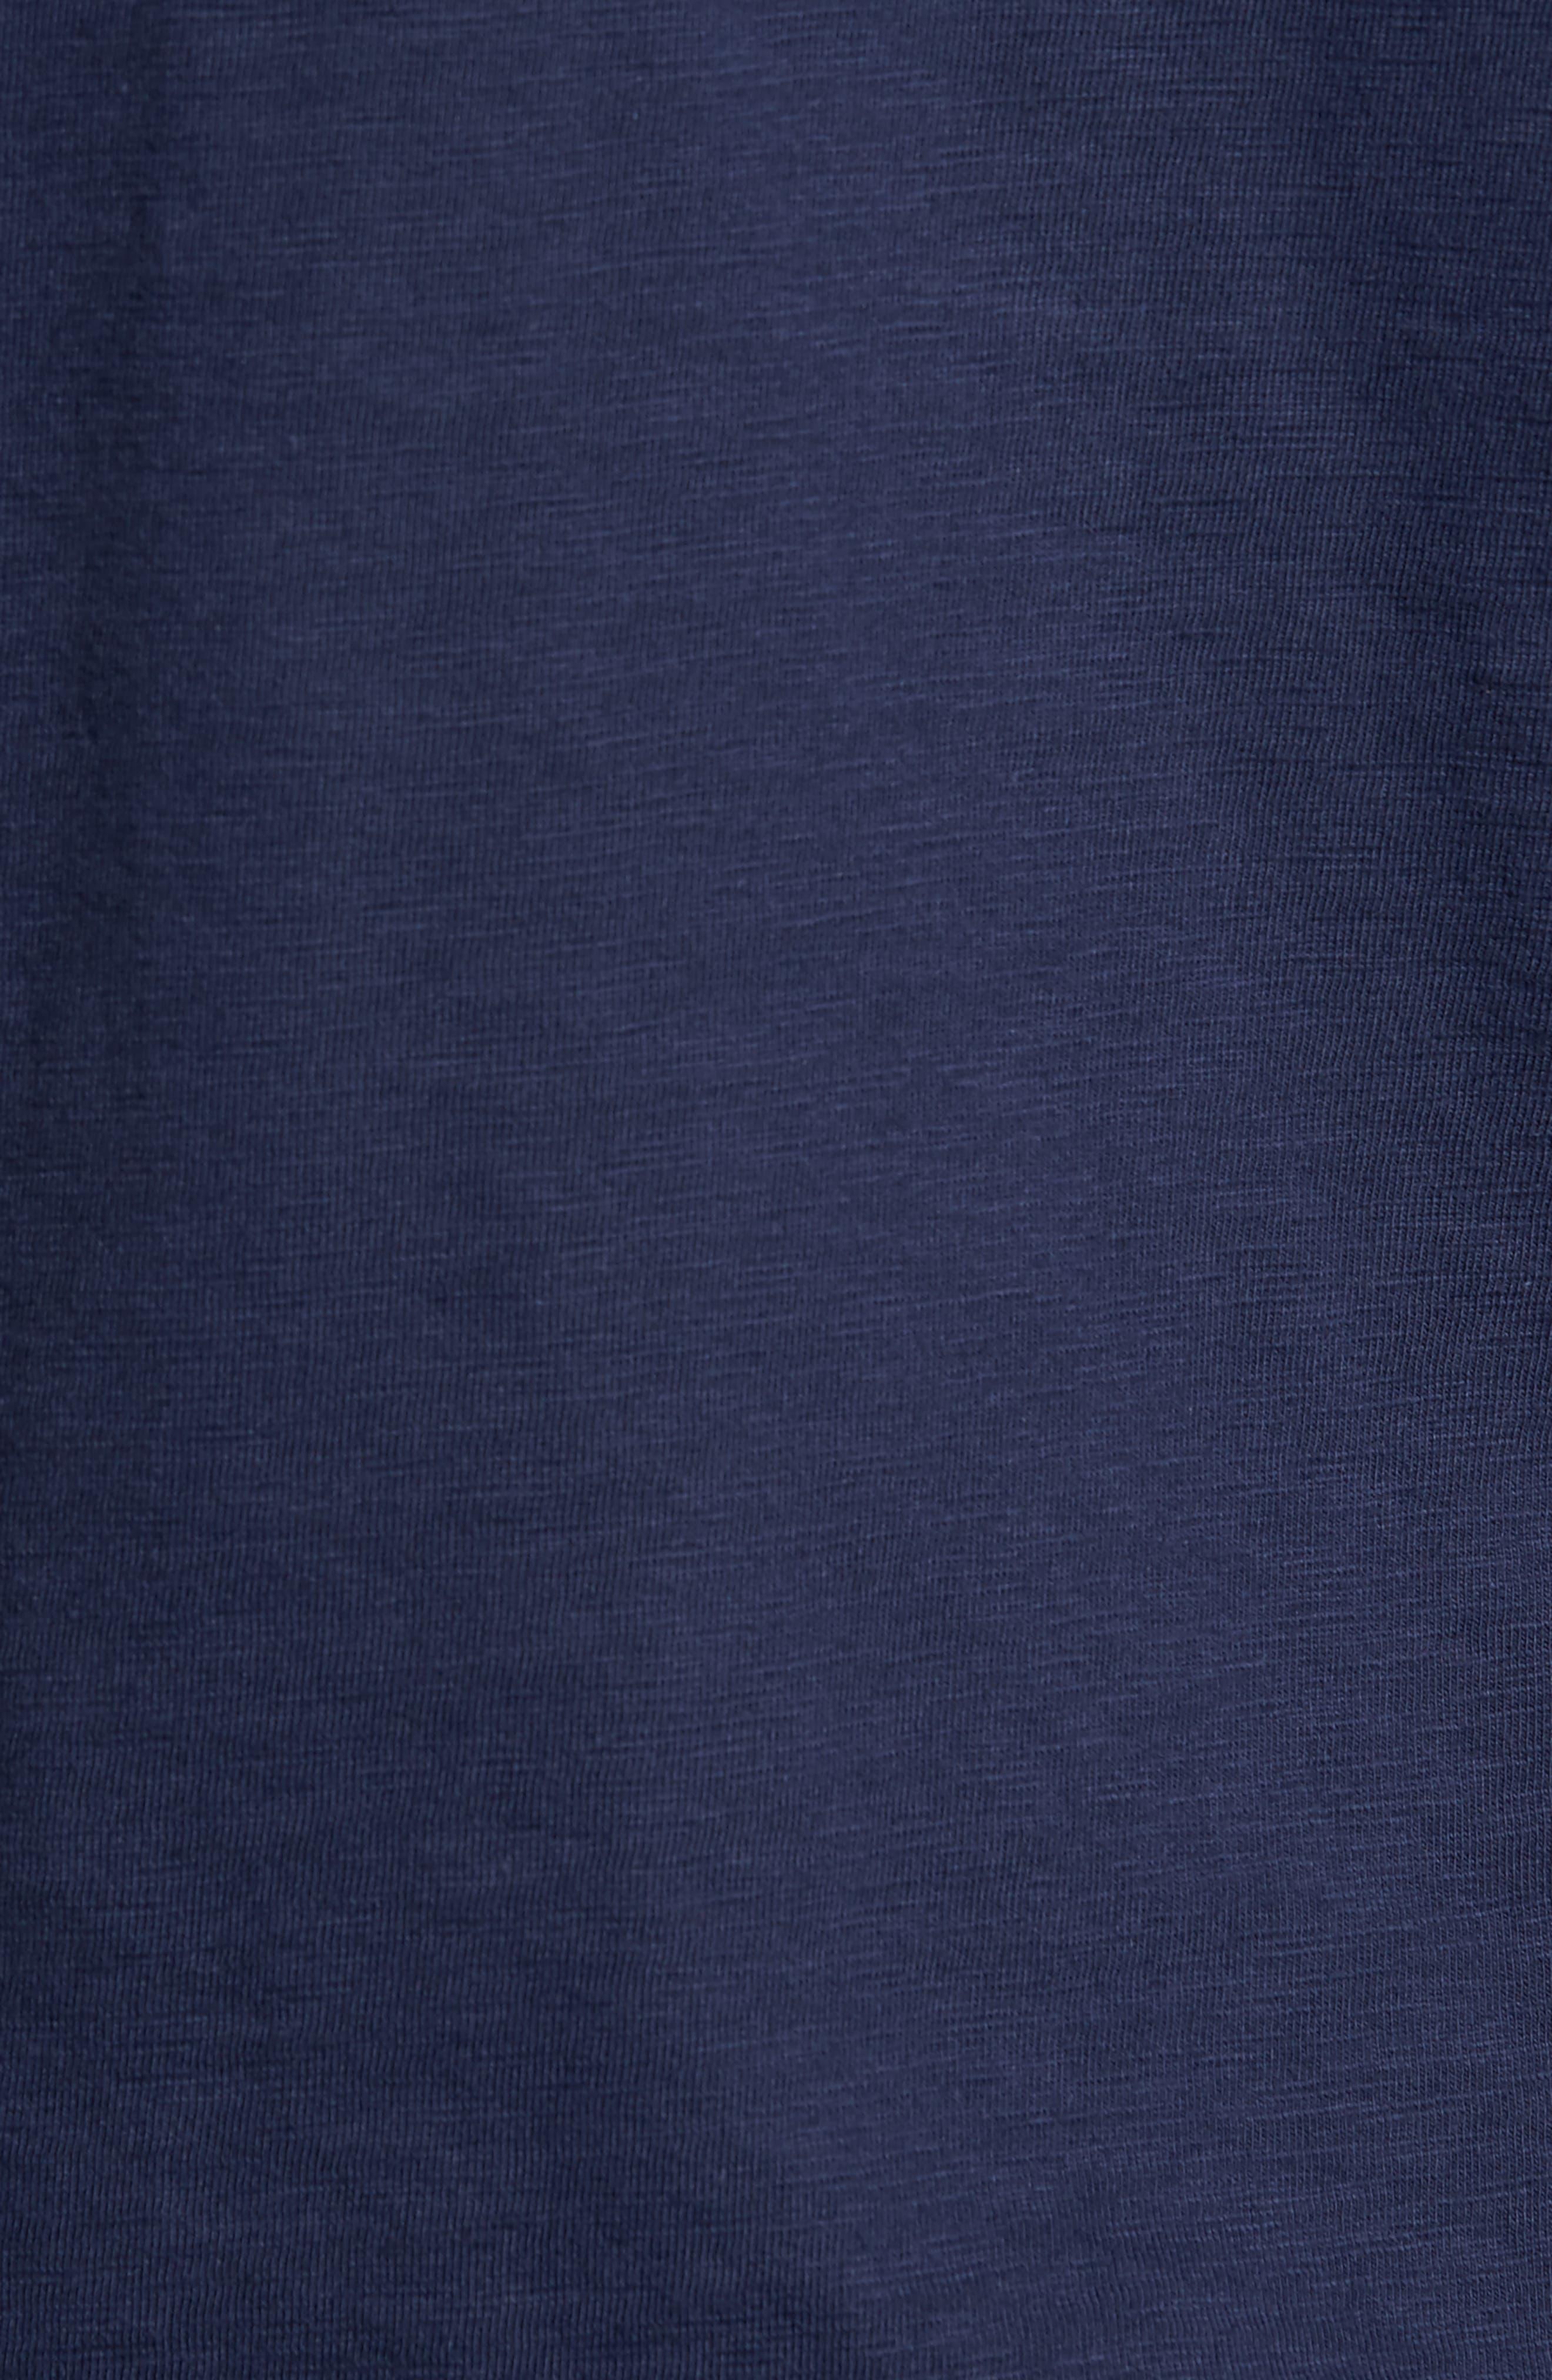 Montford Slub Pocket T-Shirt,                             Alternate thumbnail 5, color,                             408